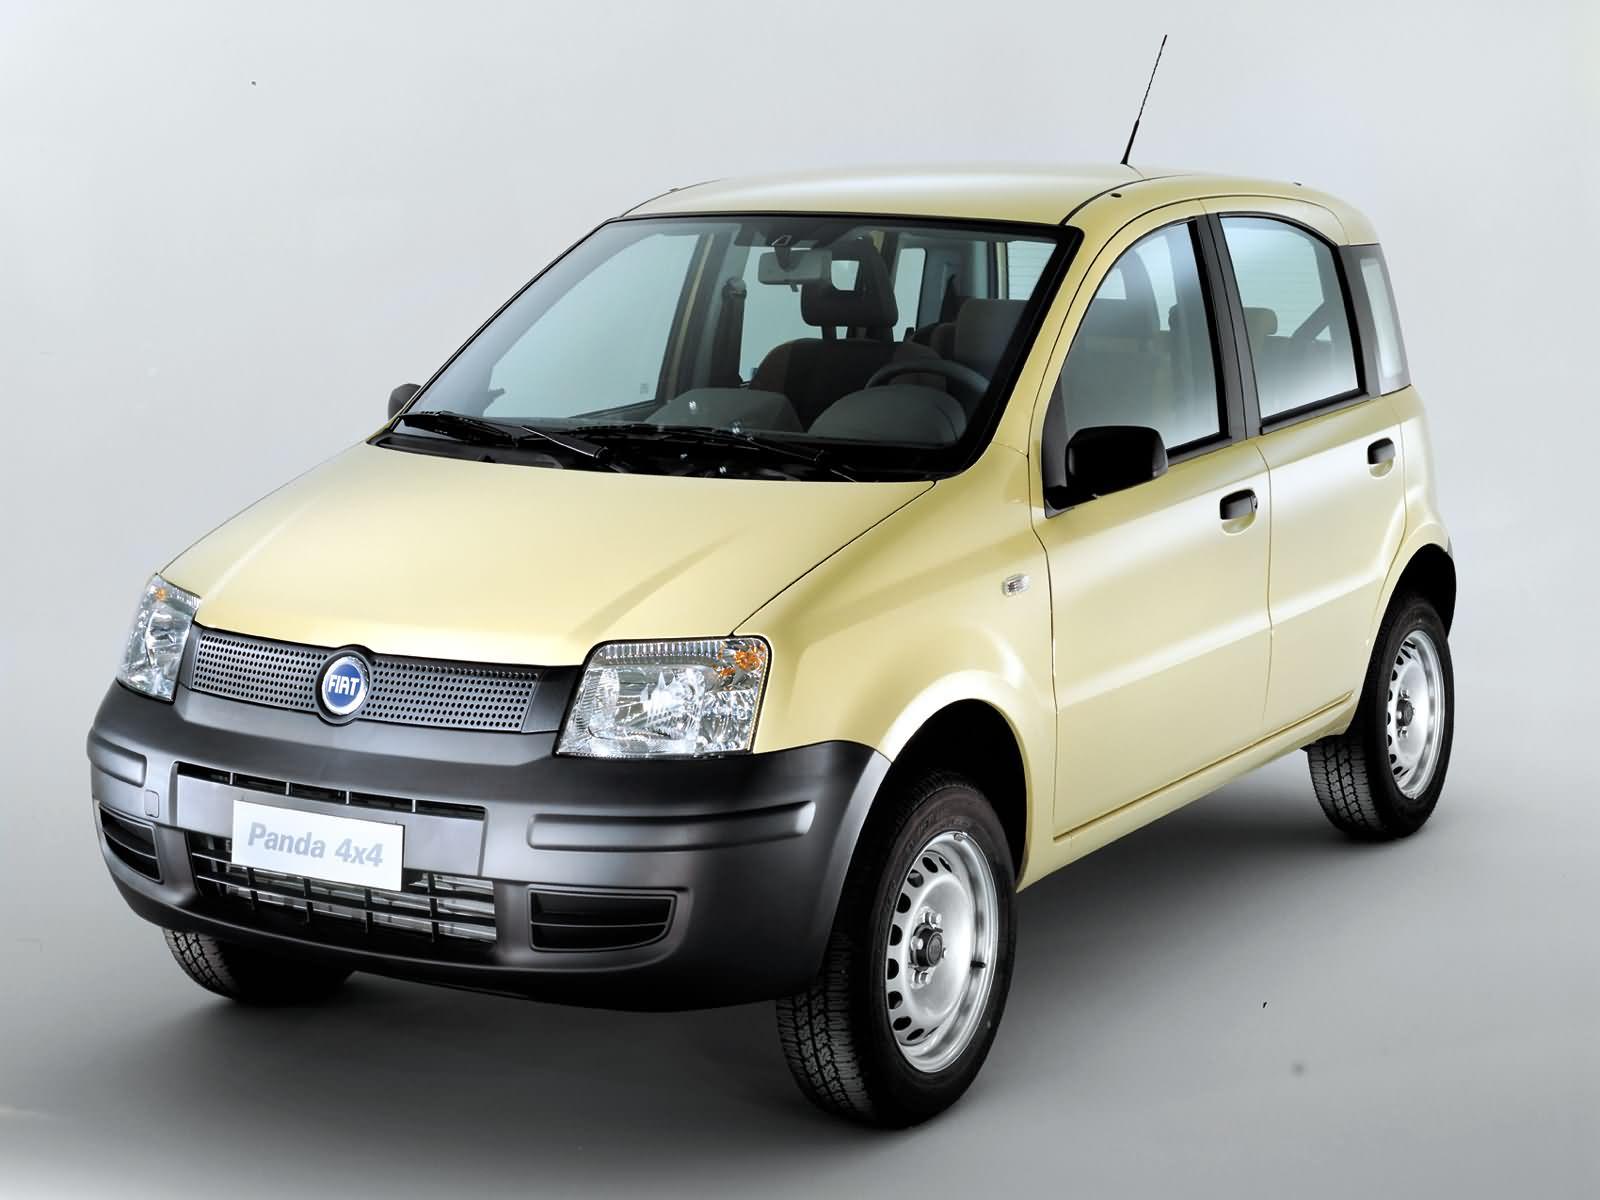 Fiat Panda 4x4 Picture 13689 Fiat Photo Gallery Carsbase Com